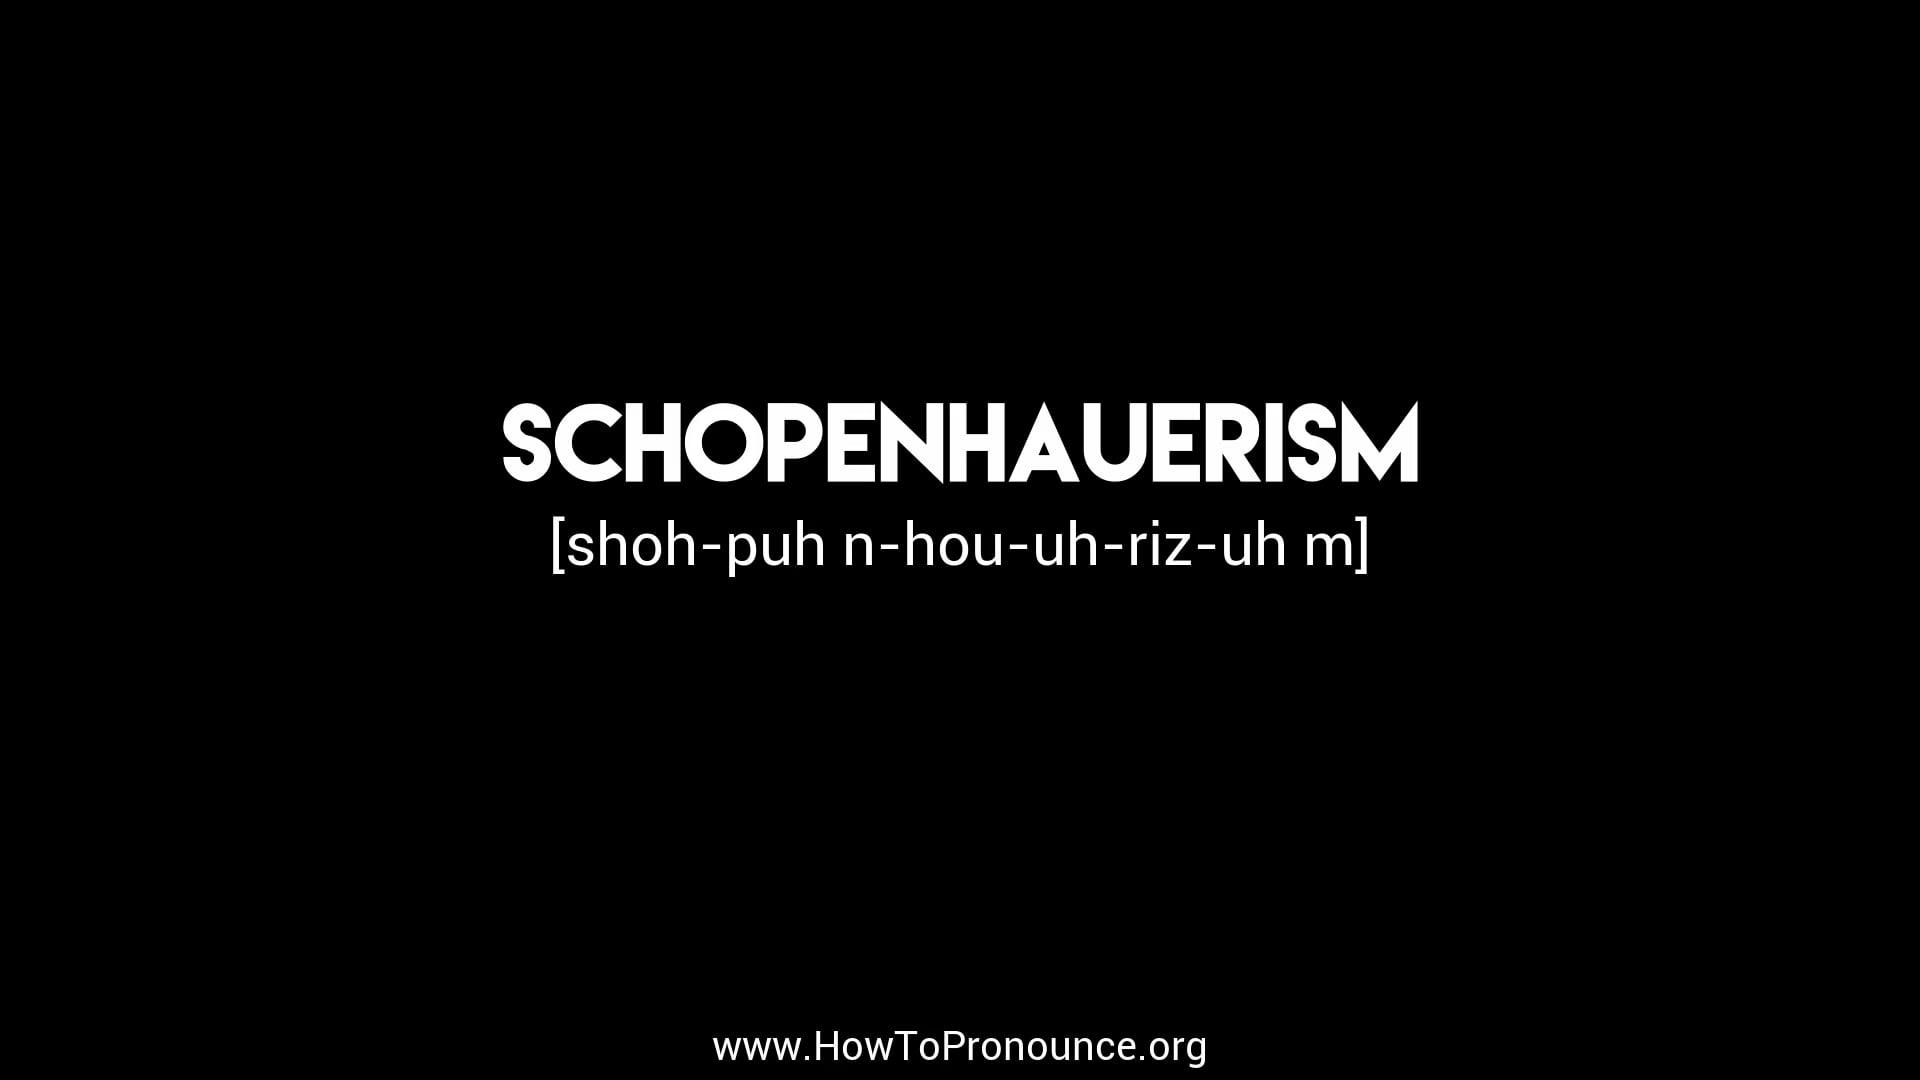 schopenhauerism